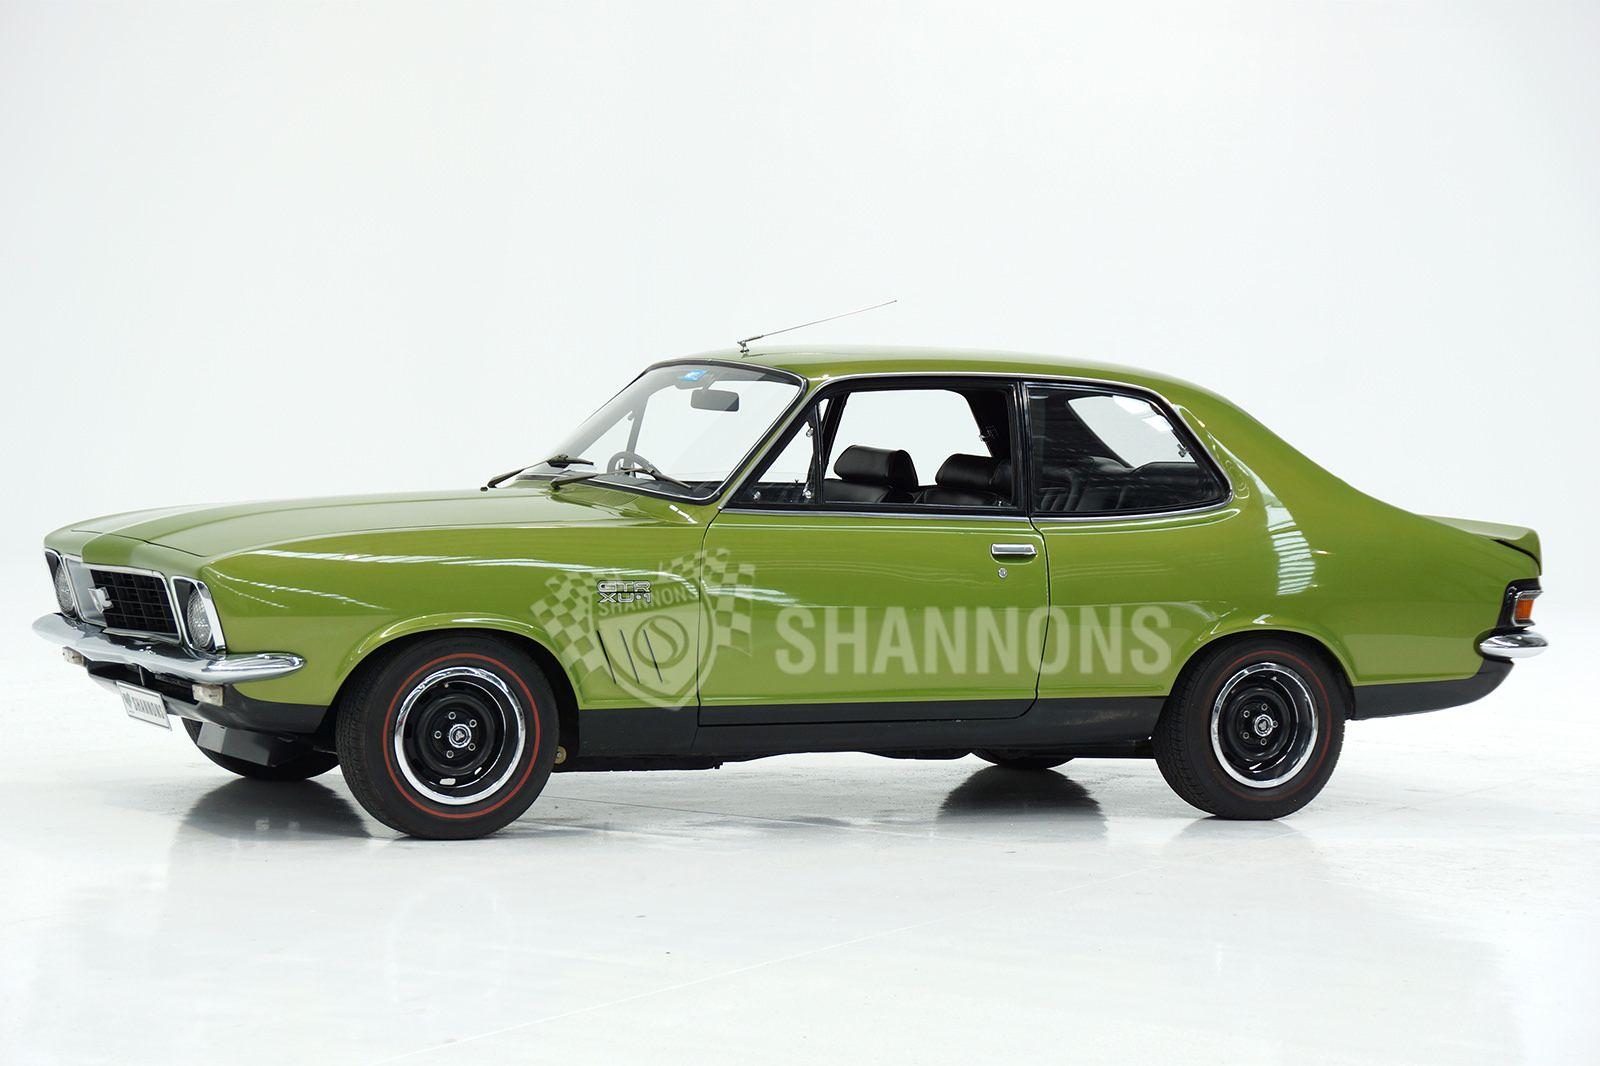 1972 Holden LJ Torana GTR XU-1 Coupe